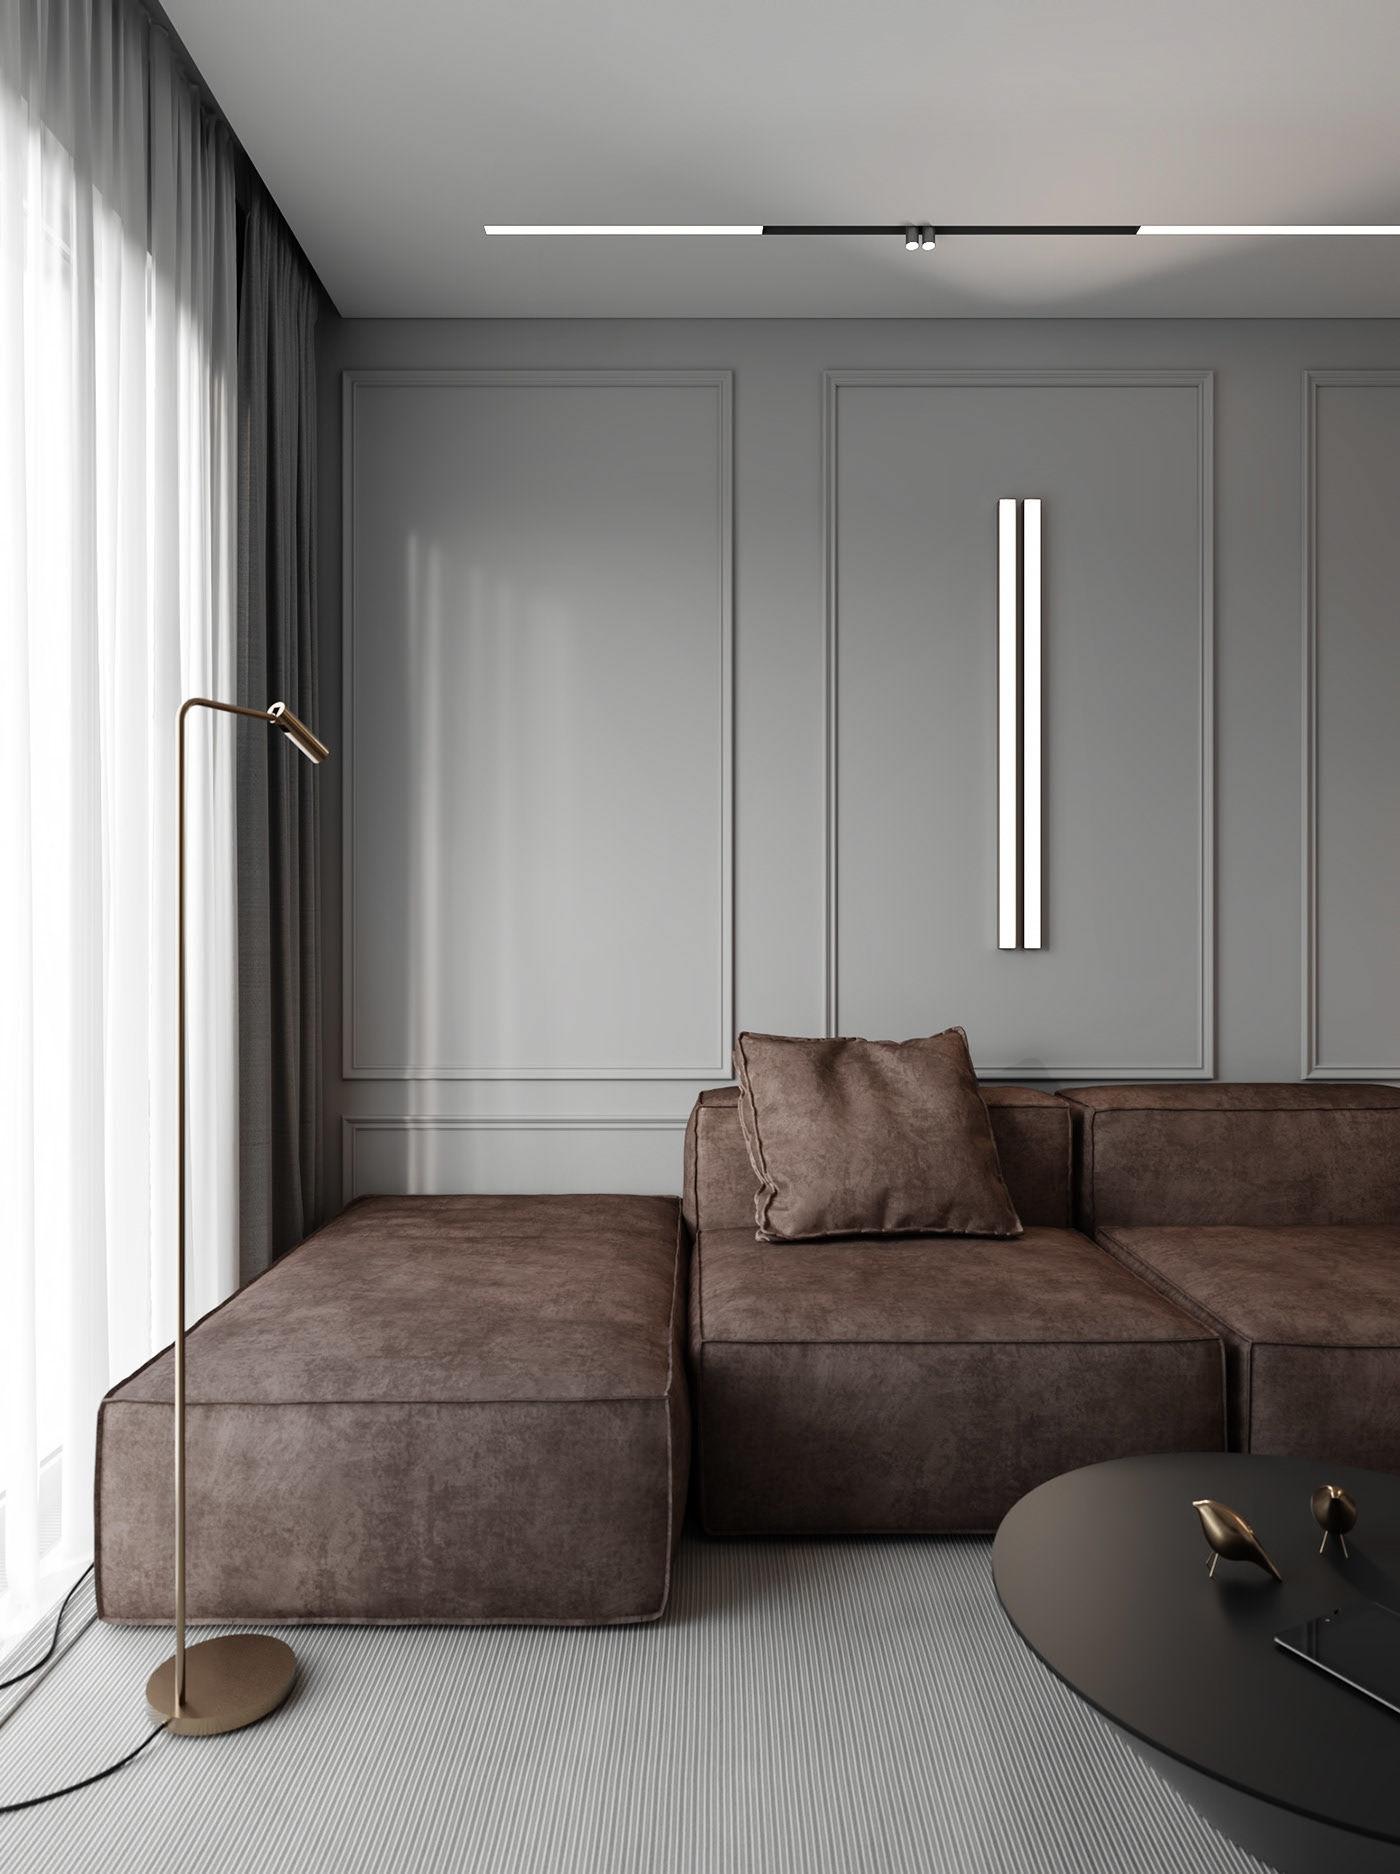 Seinaliist modernses interjööris